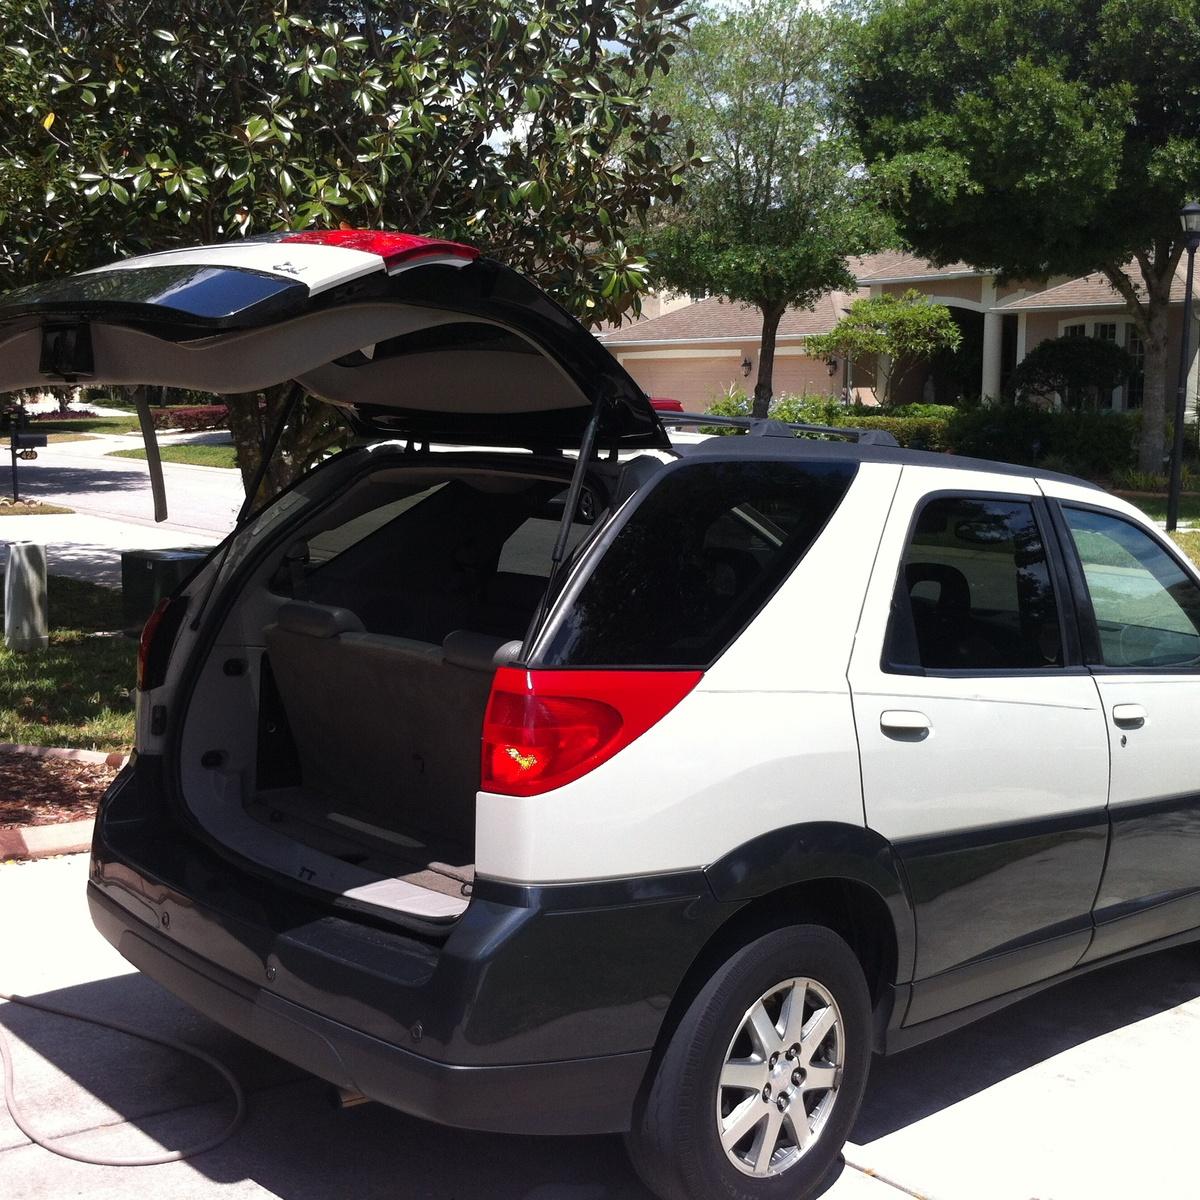 Buick Full Size Car: 2003 Buick Rendezvous